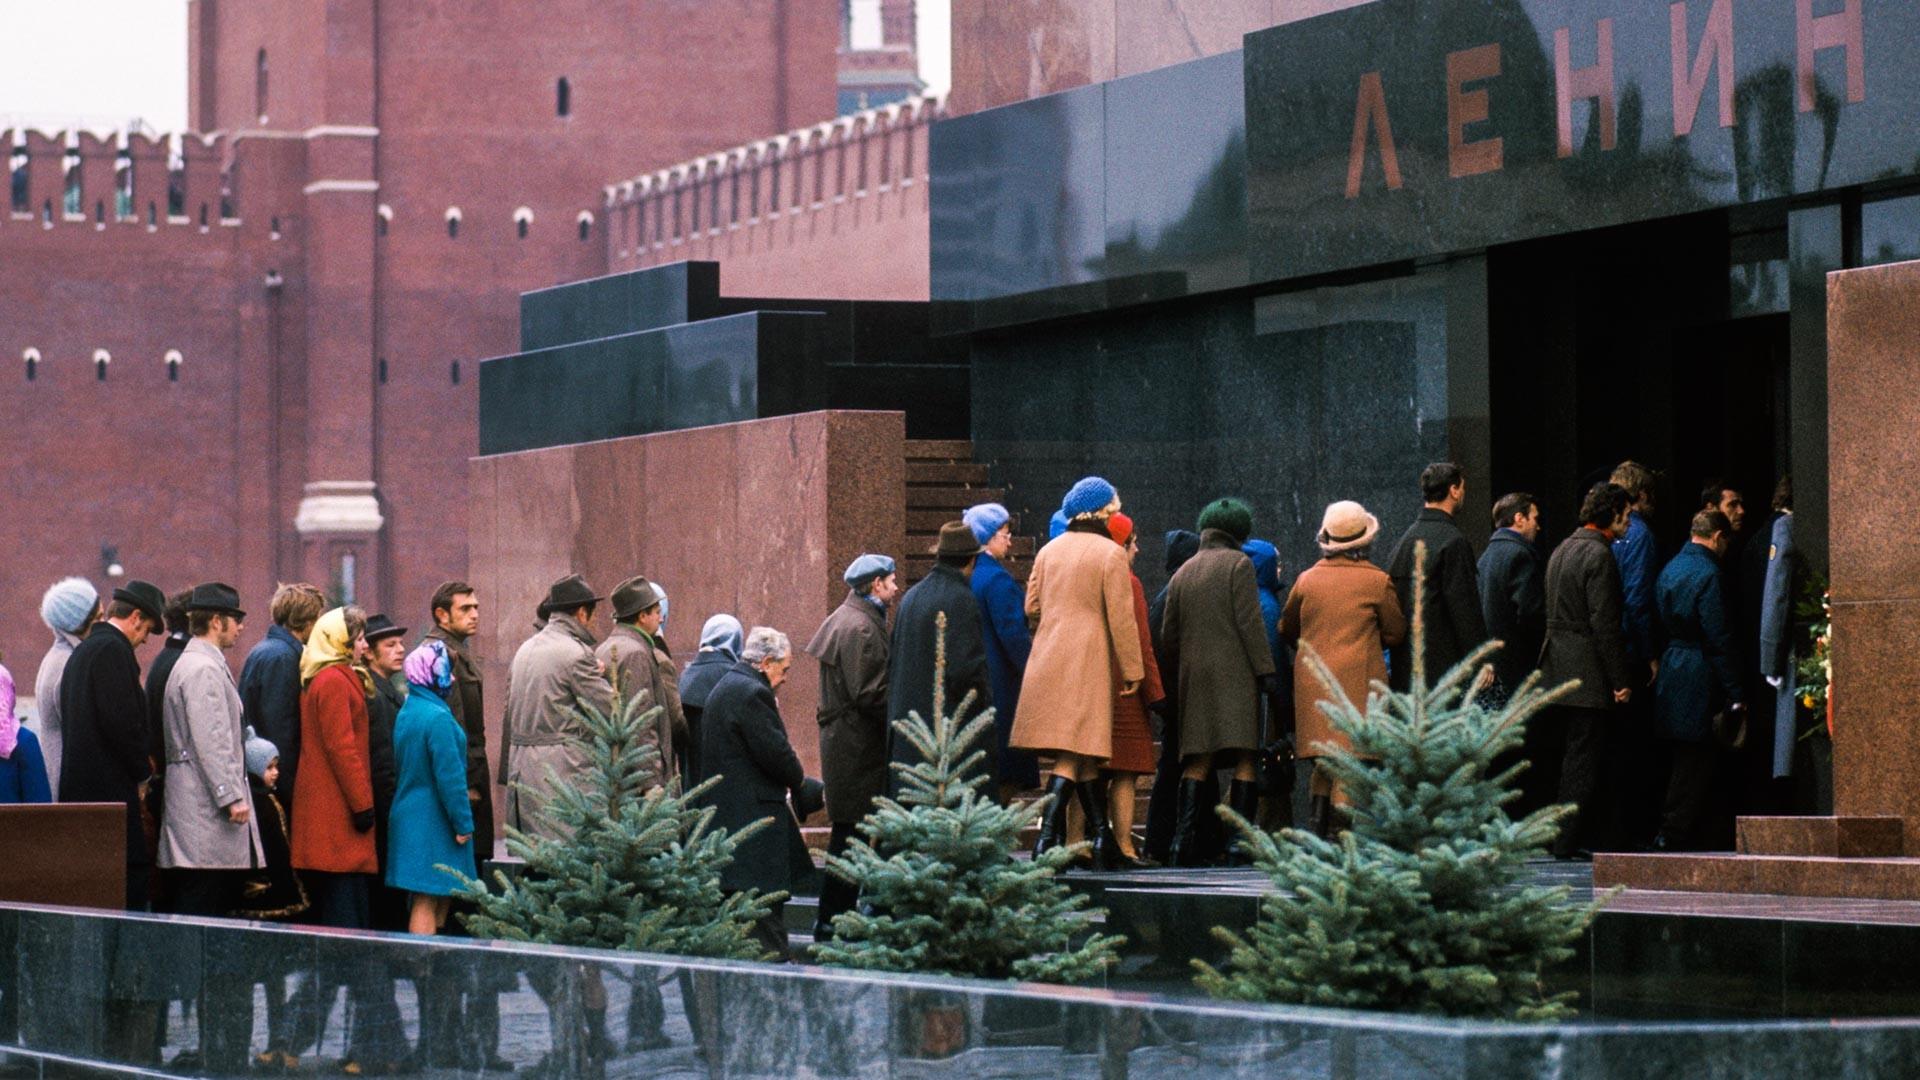 Persone in fila davanti al mausoleo in Piazza Rossa